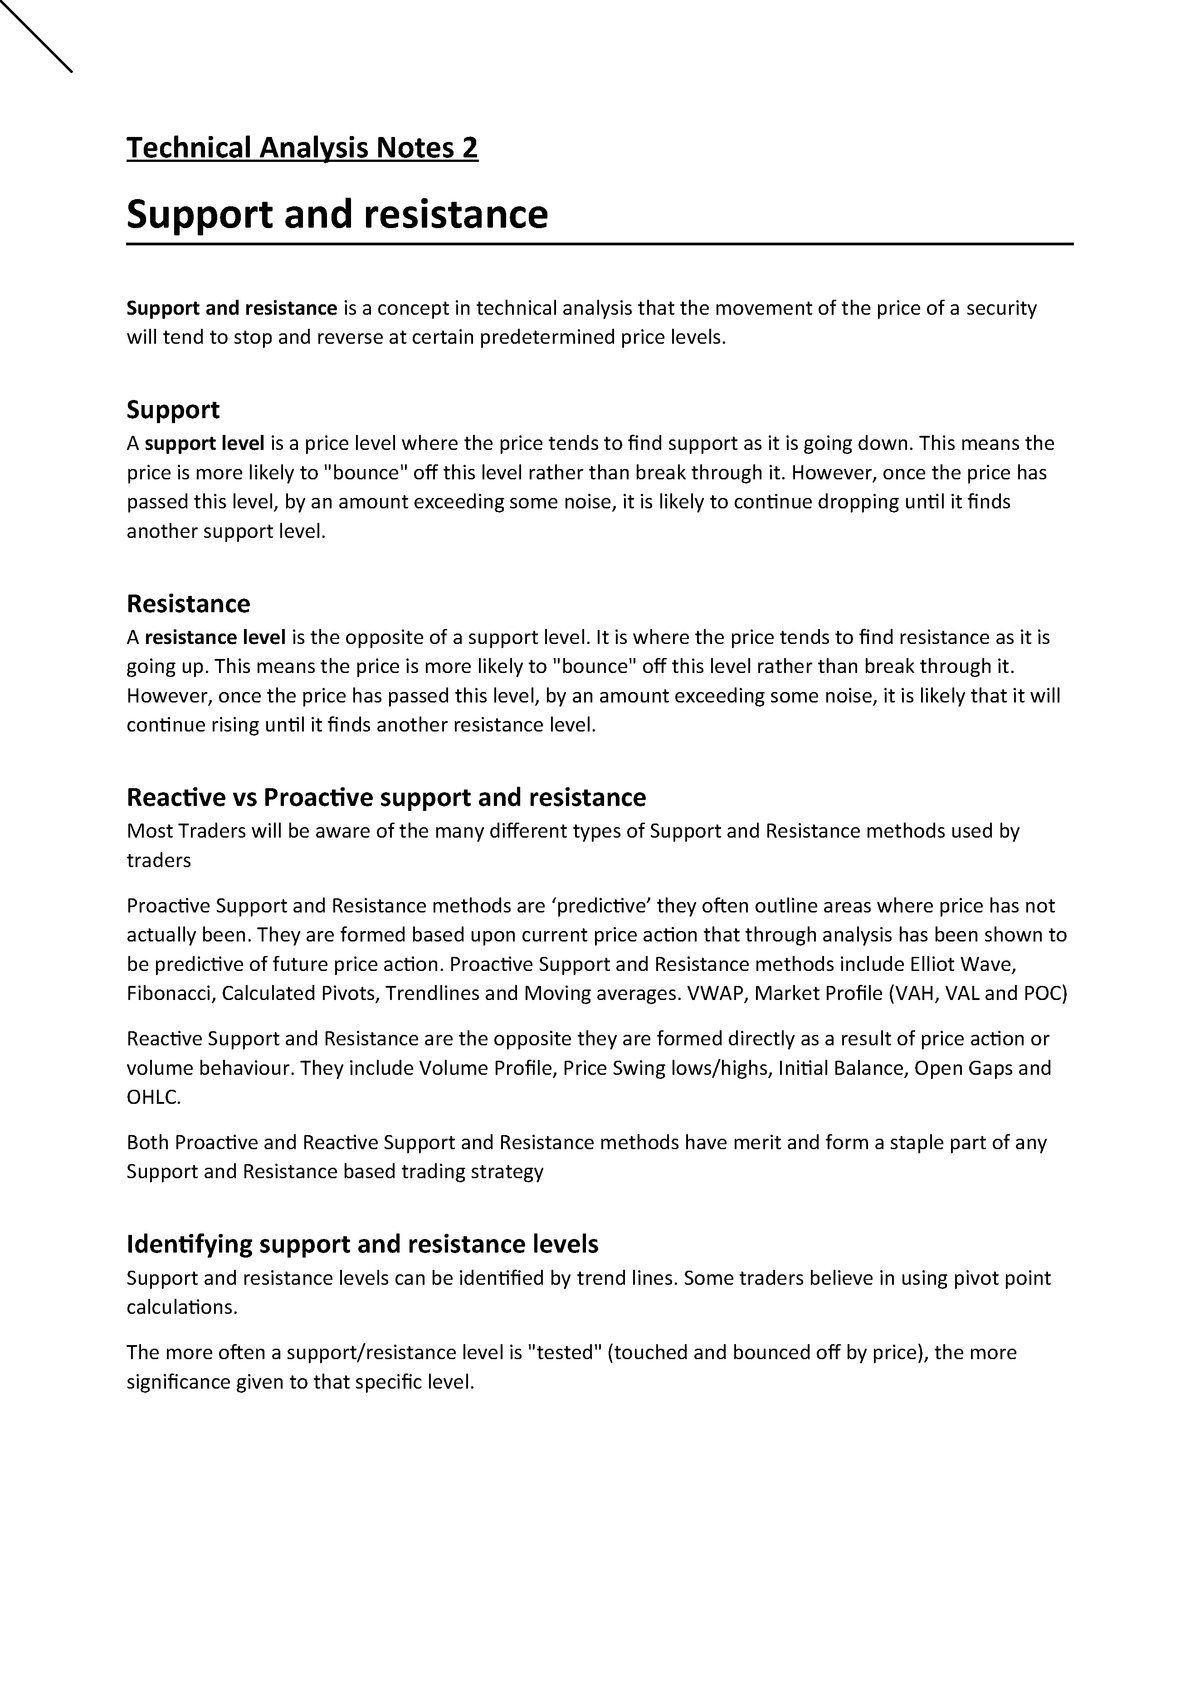 Technical Analysis Notes 2 - FIN3130: Finance - StuDocu